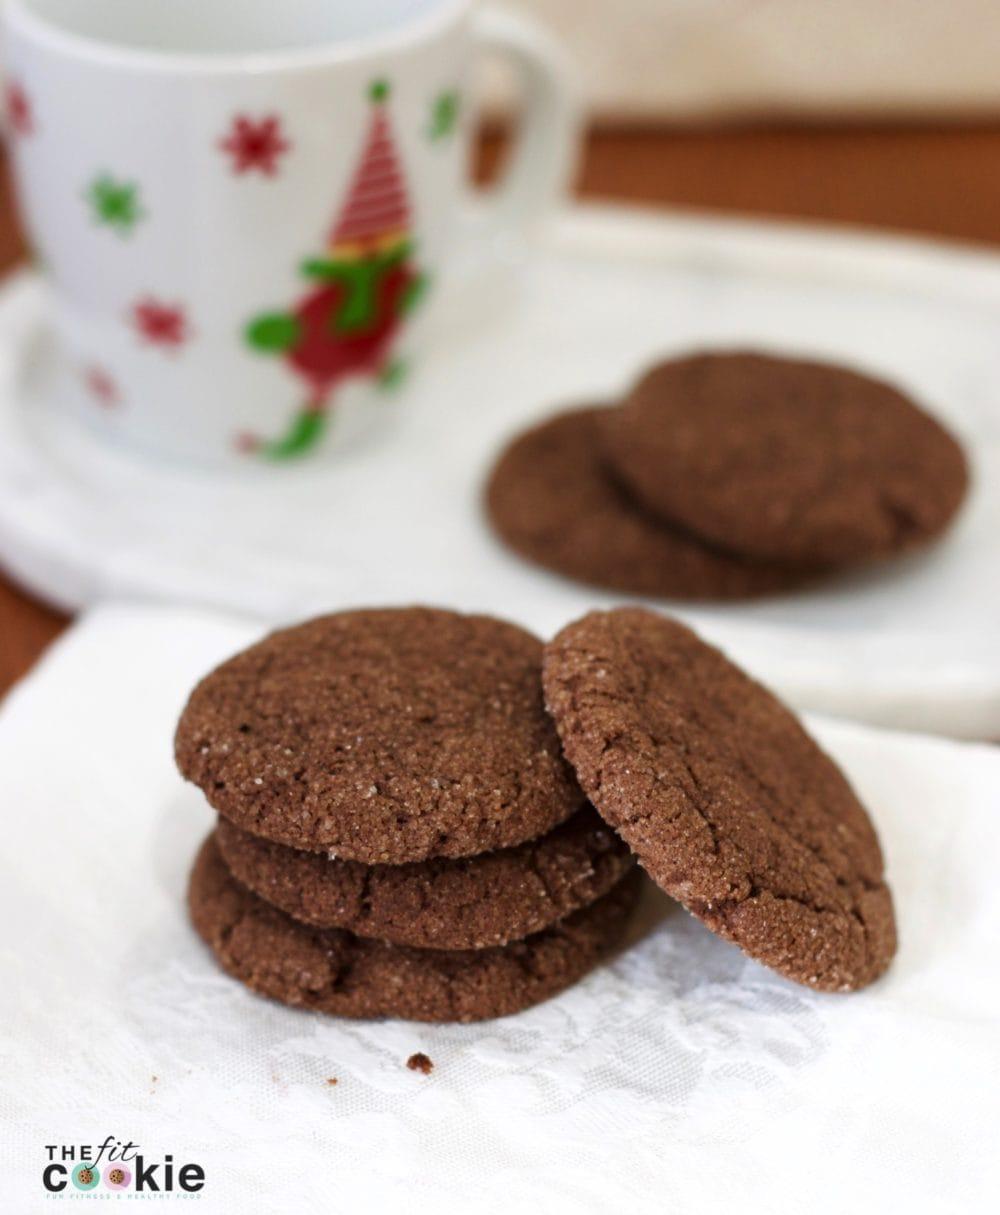 Chocolate No-Chill Vegan Sugar Cookies: quick and easy to make - #recipe #vegan @thefitcookie